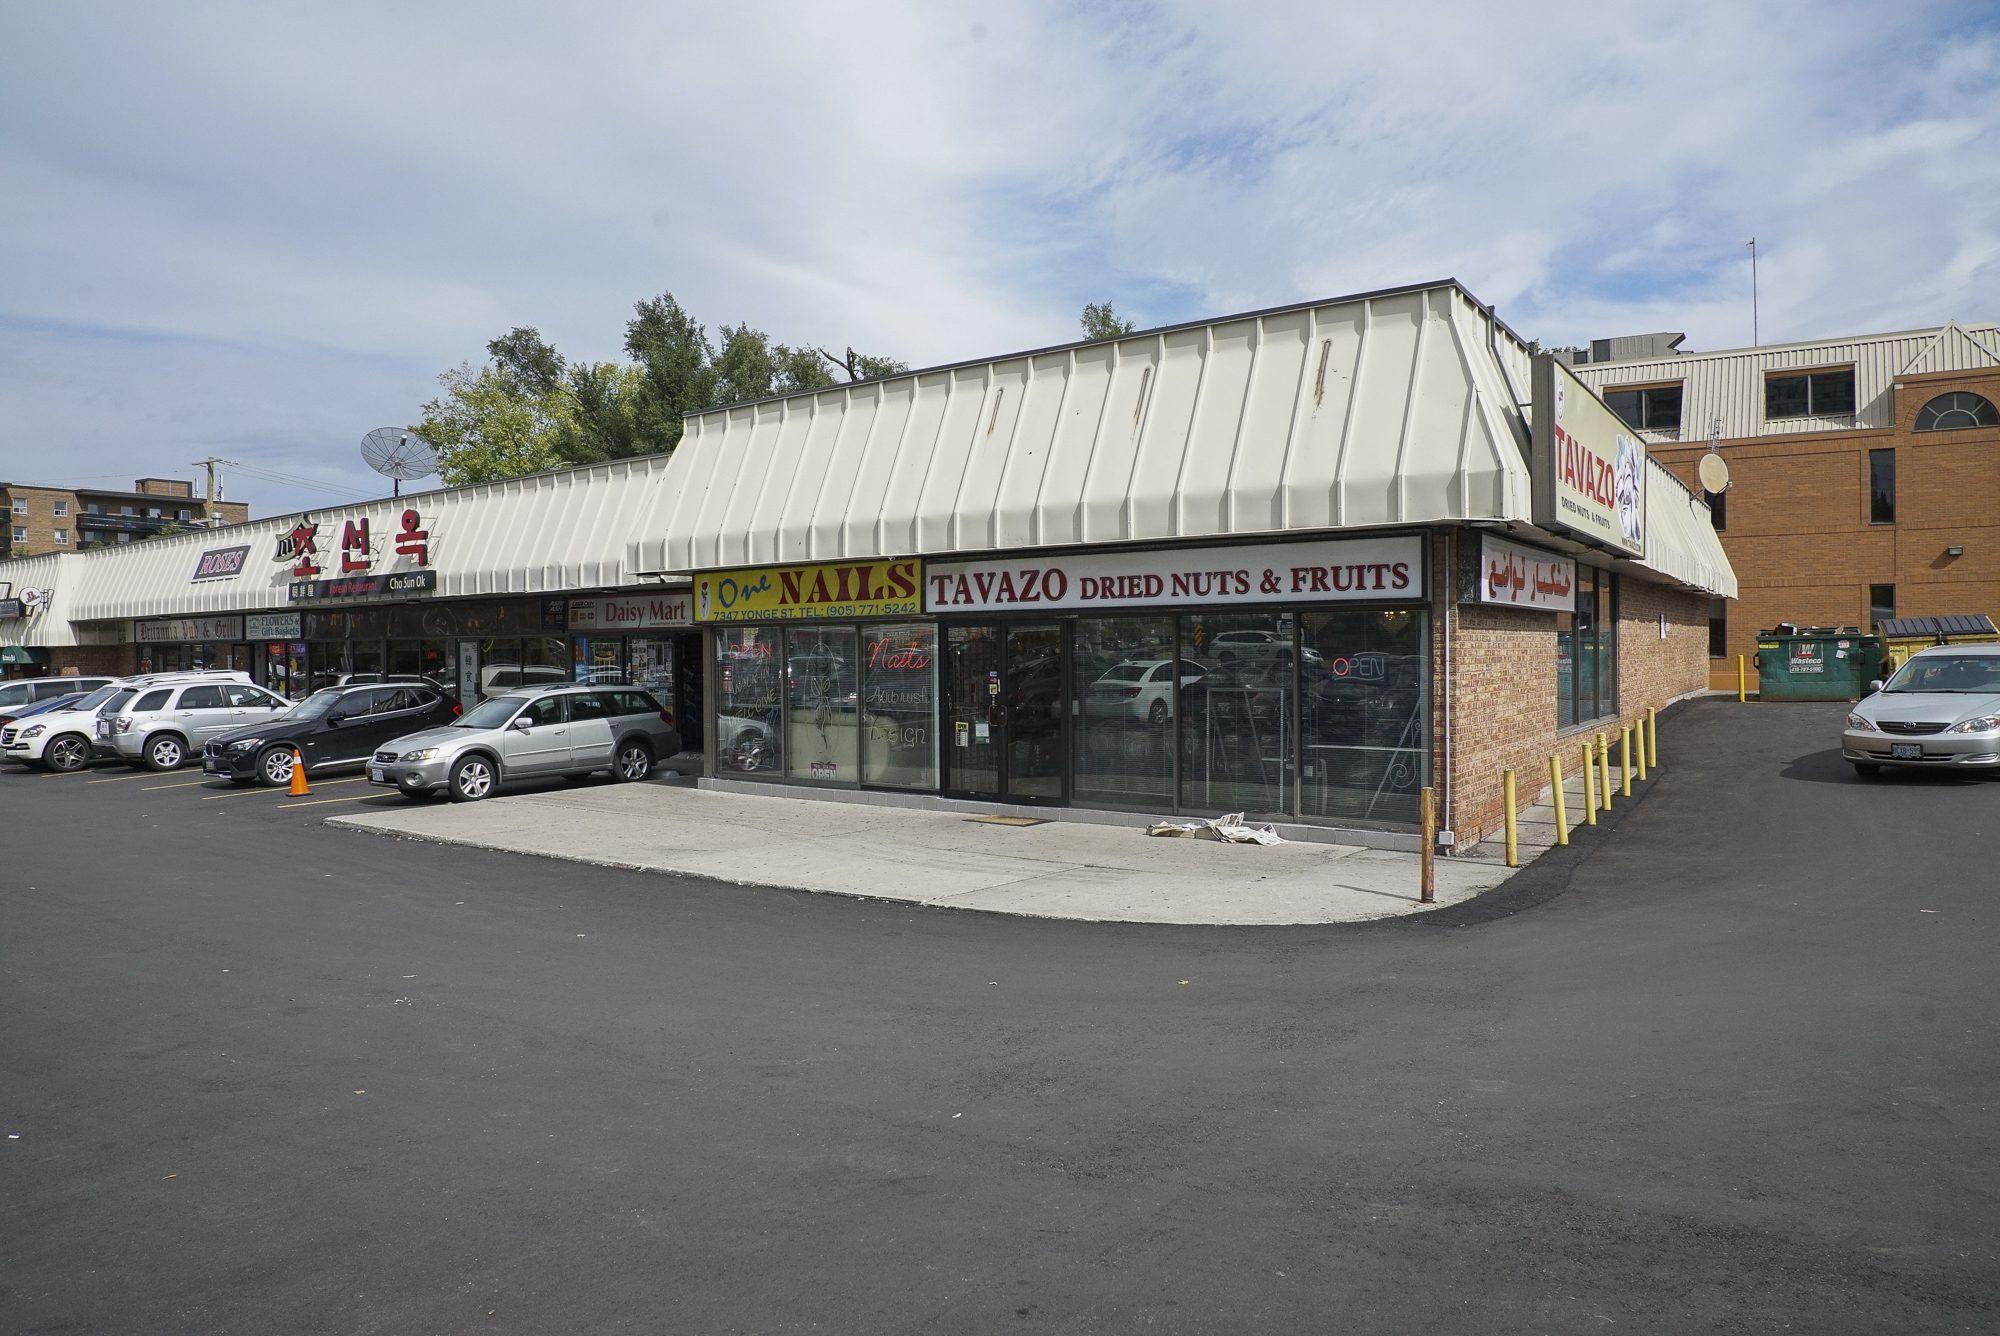 toronto-restaurants-chefs-in-the-burbs-samira-mohyeddin-banu-north-york-tavazo-exterior